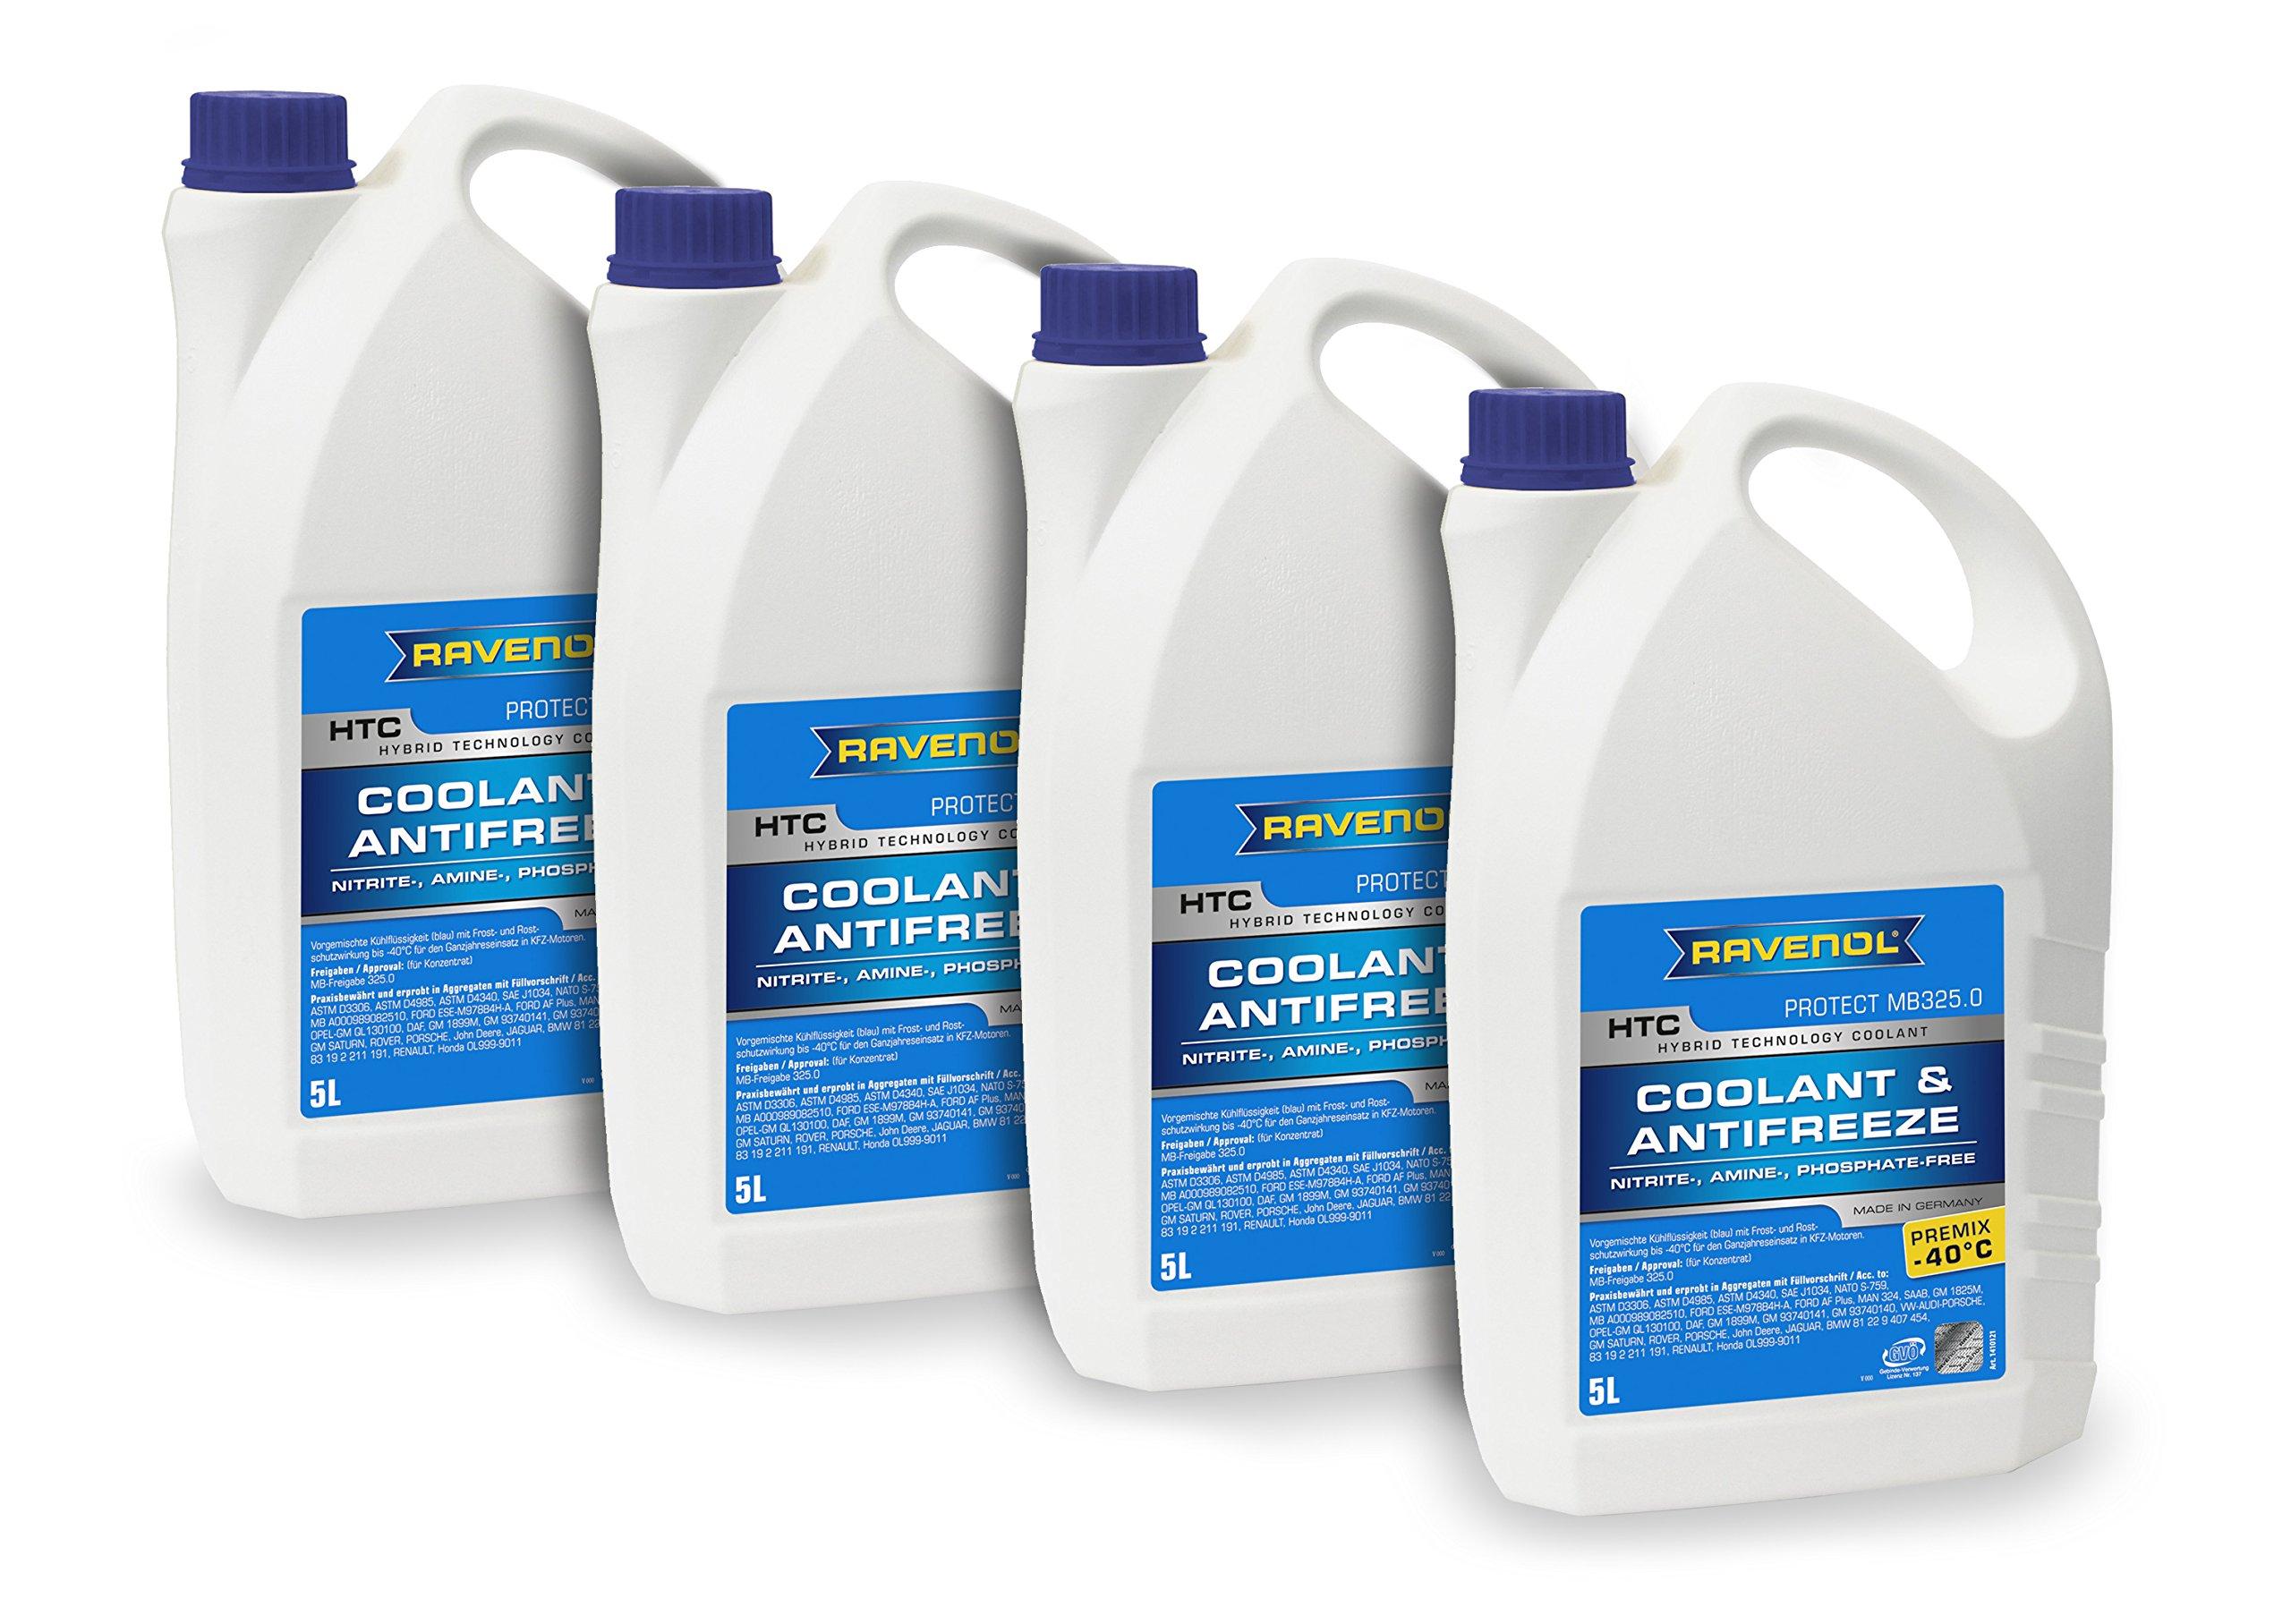 Buy Ravenol J4d2023 1 04 Coolant Antifreeze Htc Premix Mb 3250 Land Rover Vw Tl